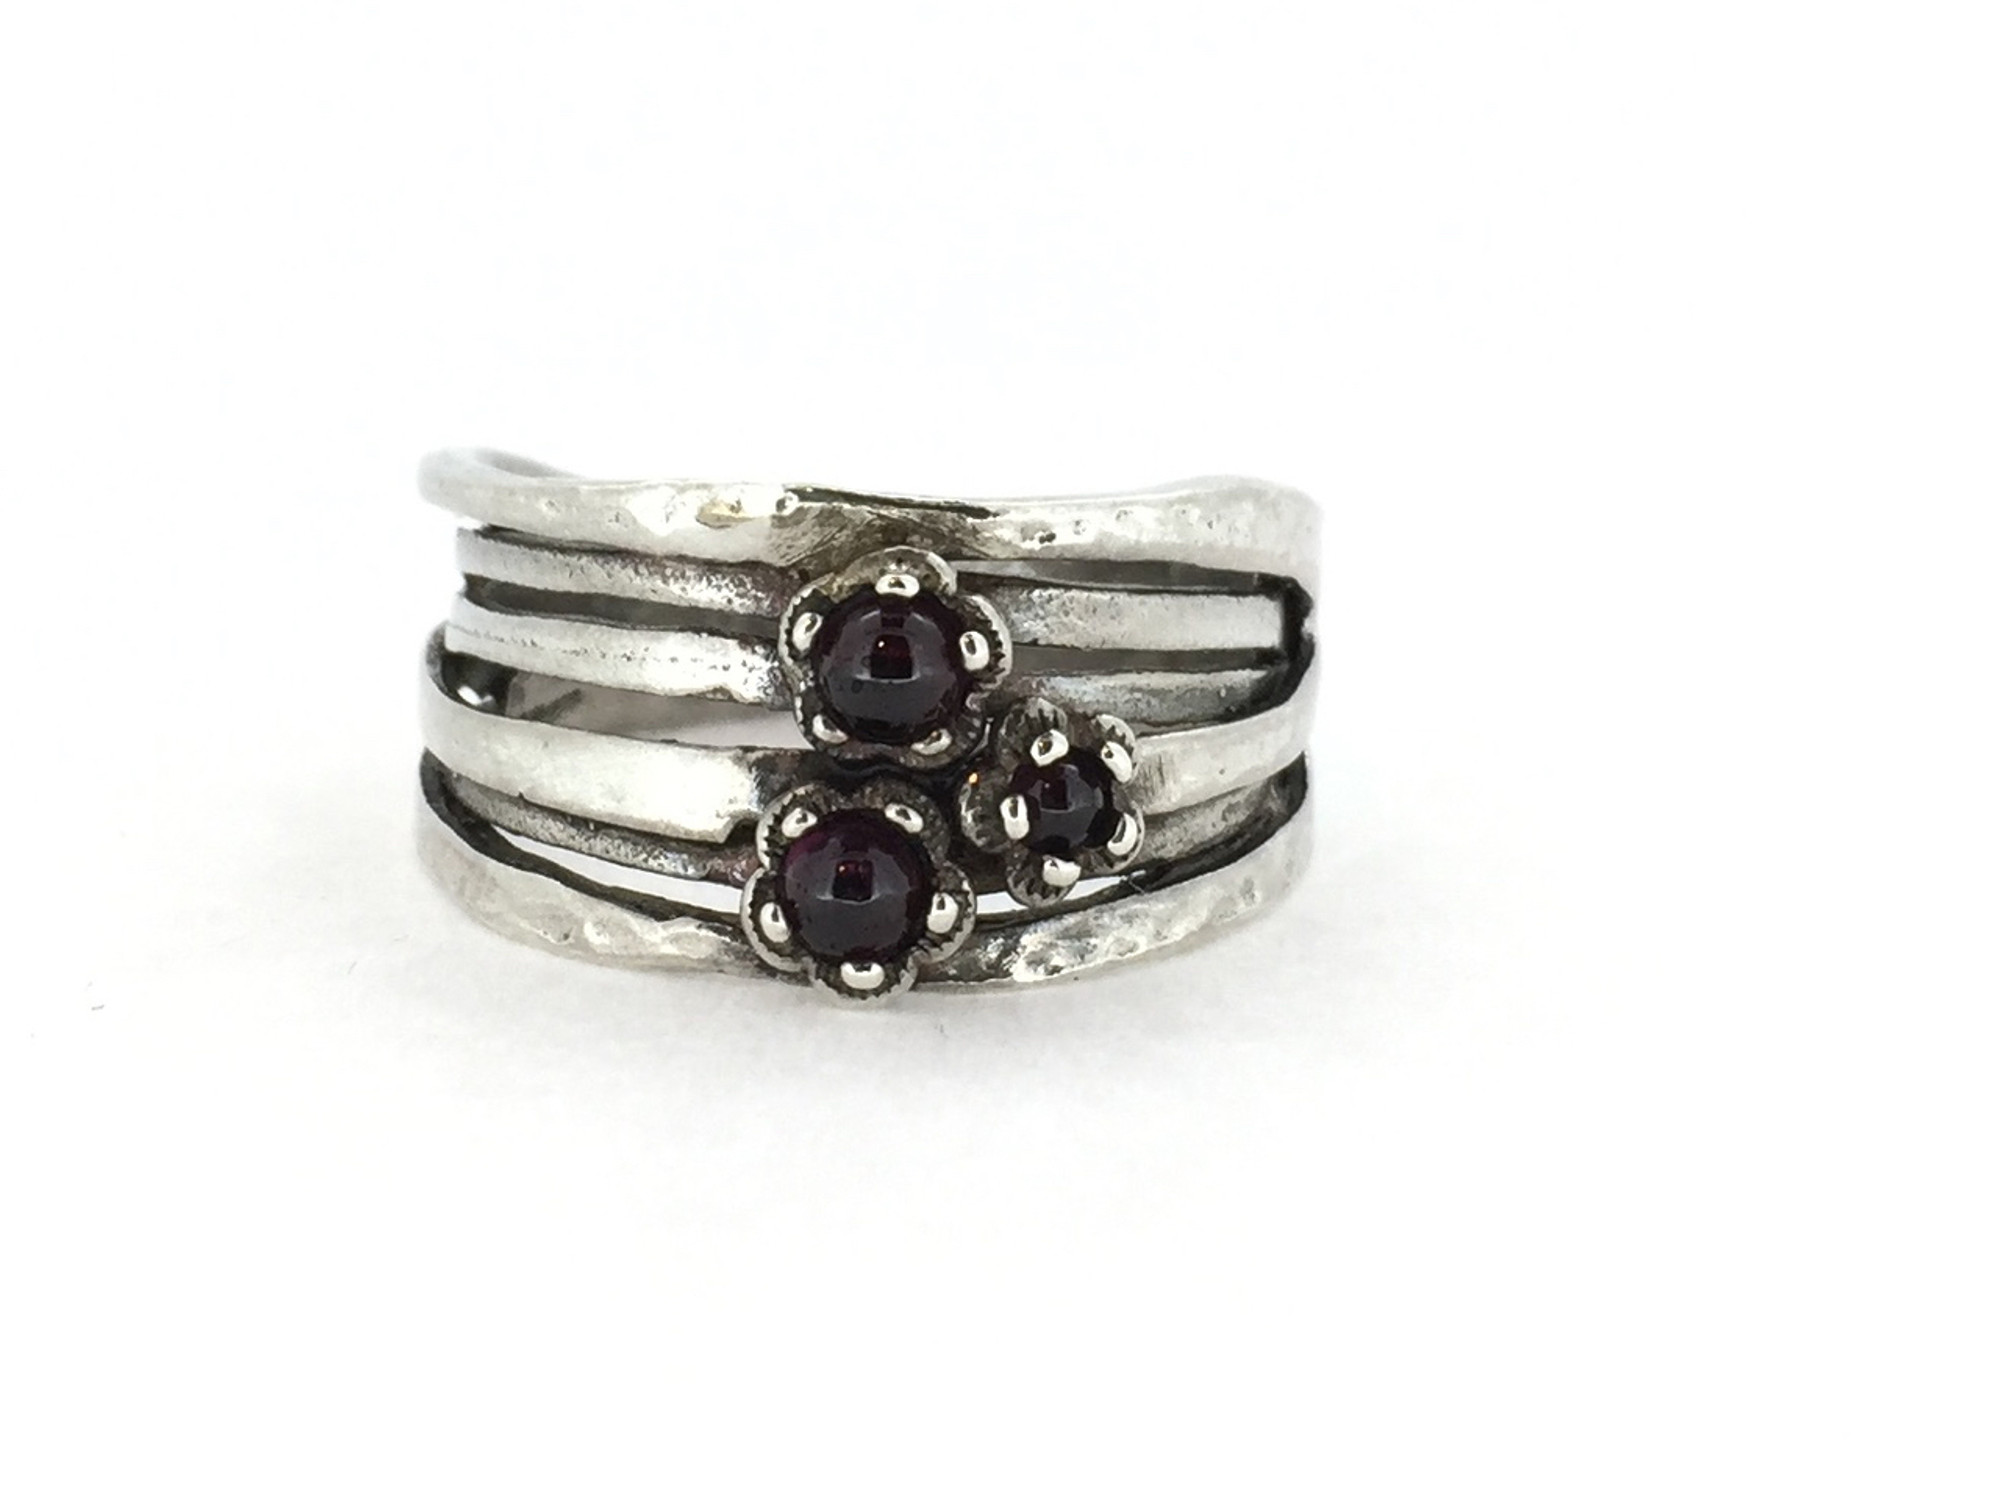 e6fc8309c 3-Stone Garnet Wide Ring - Mima's Of Warwick, LLC